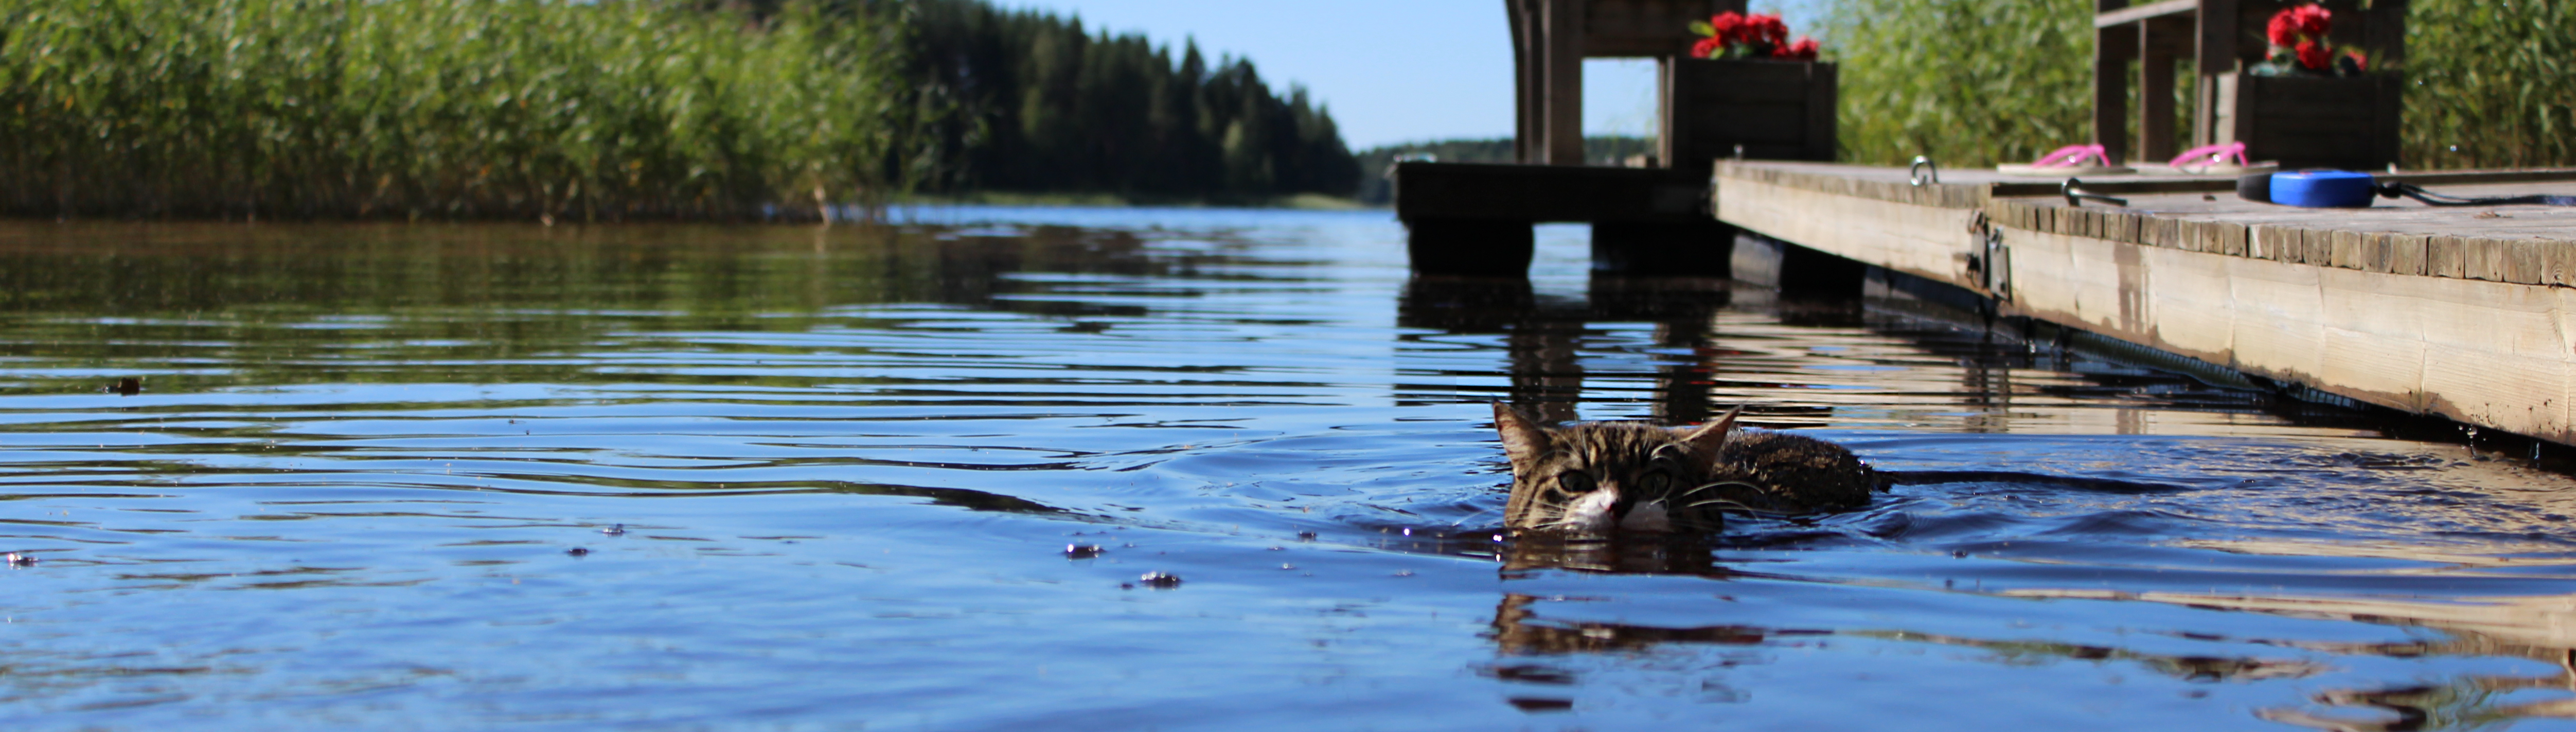 Miisa having a quick swim.. photo